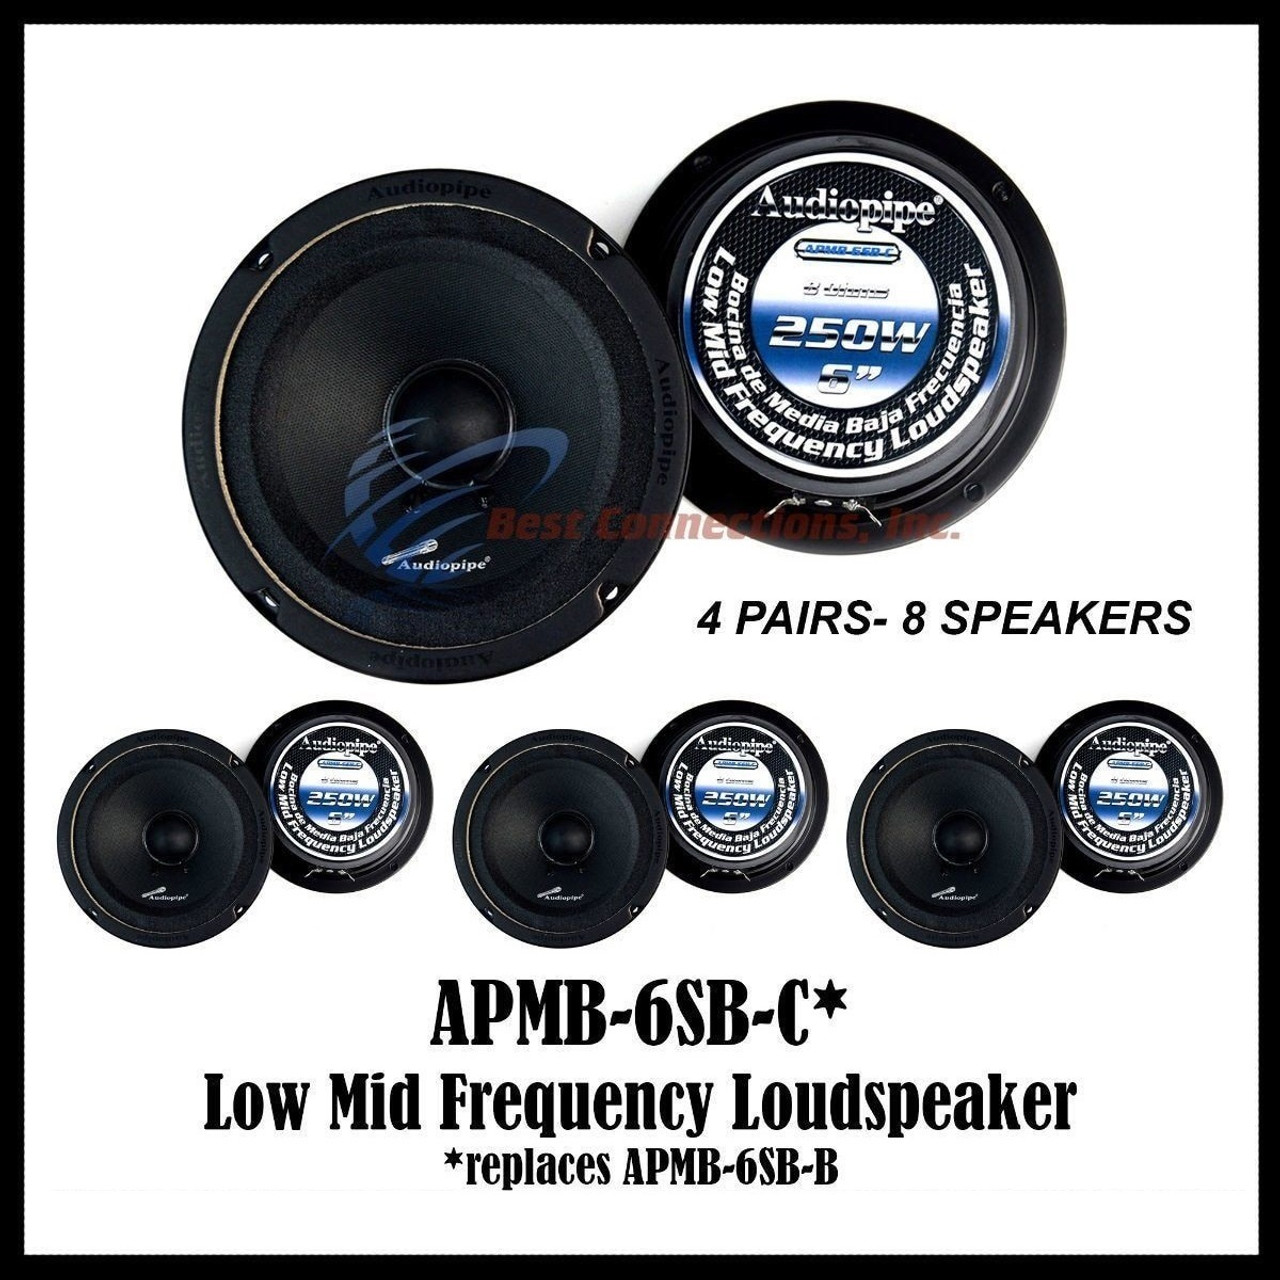 2 Pair Audipipe APMB-6SB-C Sealed Back Car Audio Full Range Loud Speakers 4 Pcs